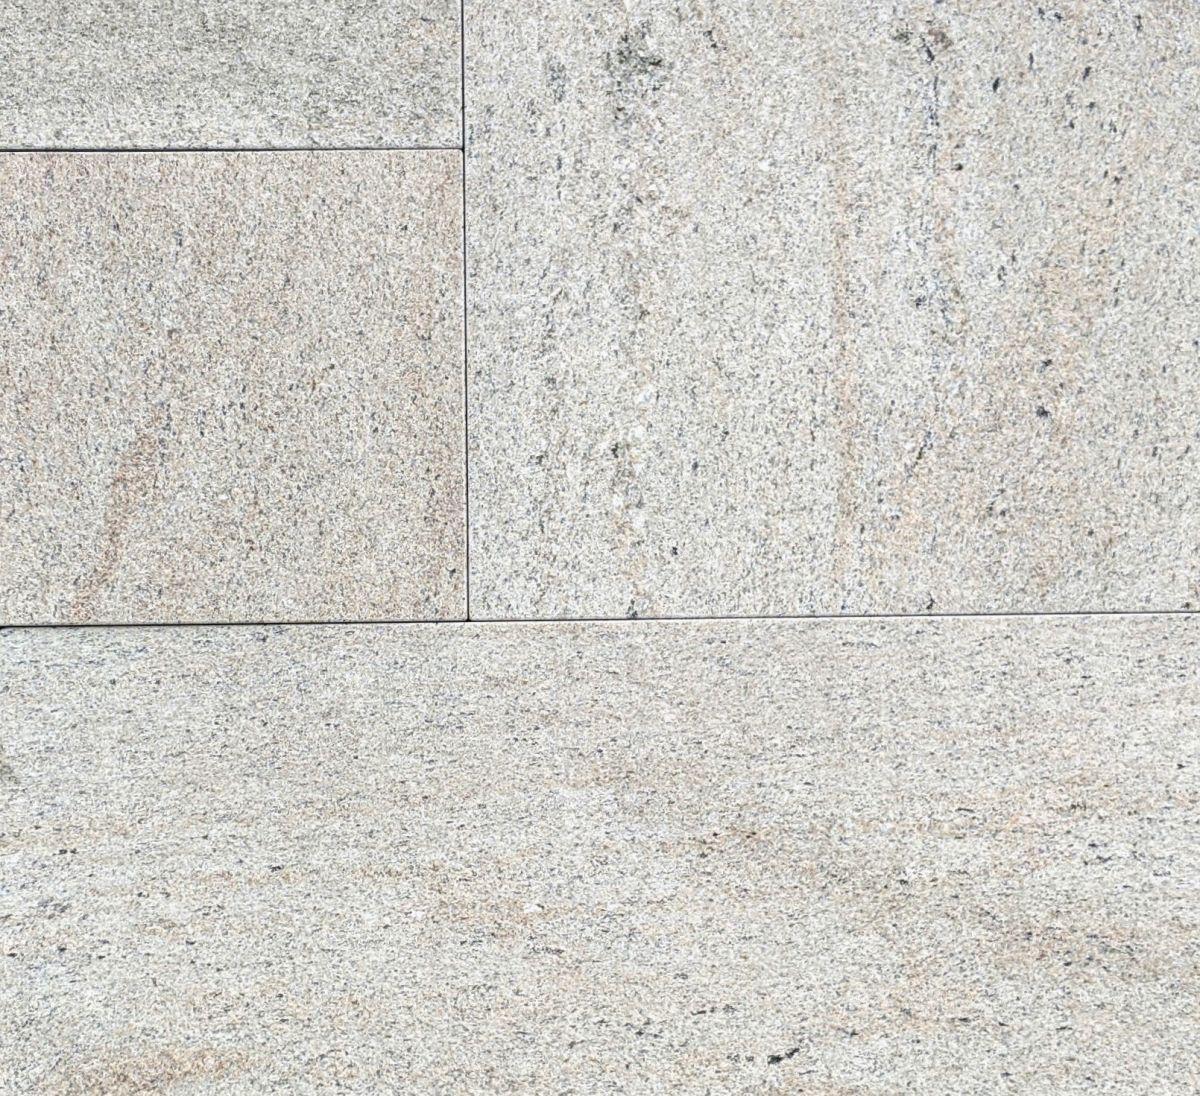 Pavers   Sunset Granite Thermal   Swatch (2)